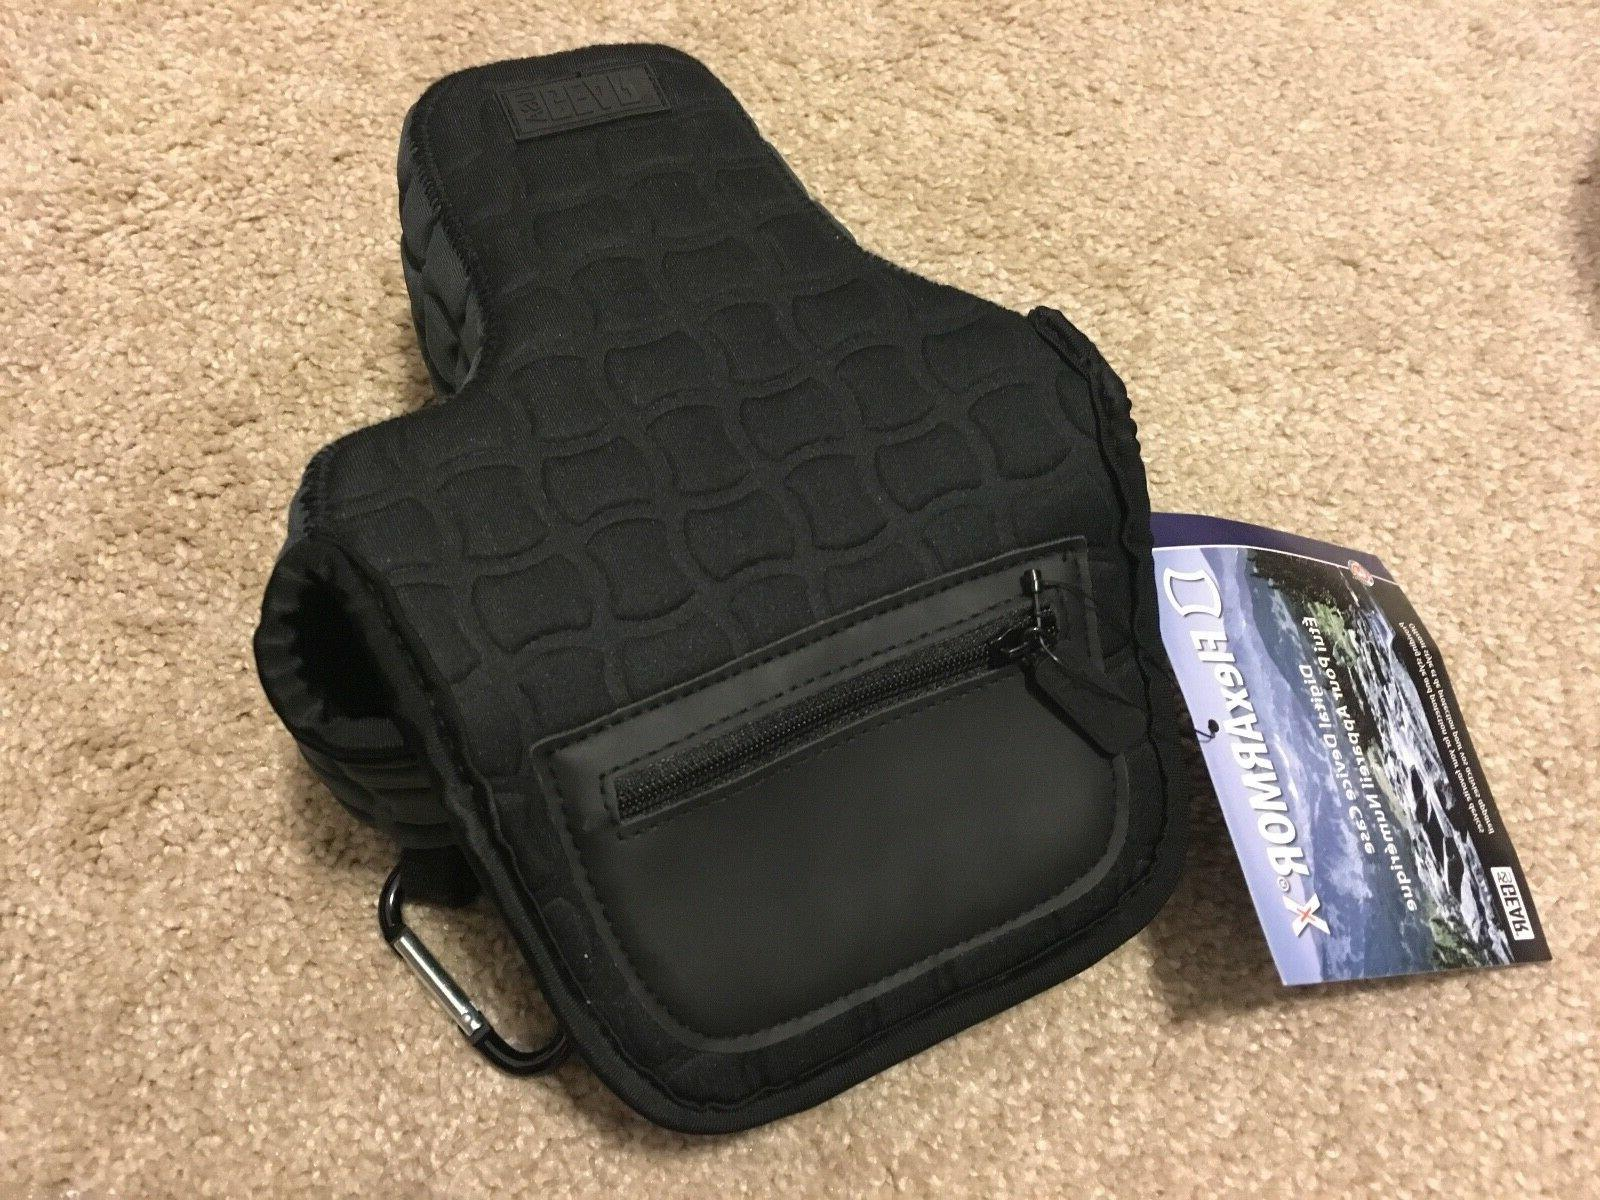 USA Gear DSLR Sleeve Accessory Pocket